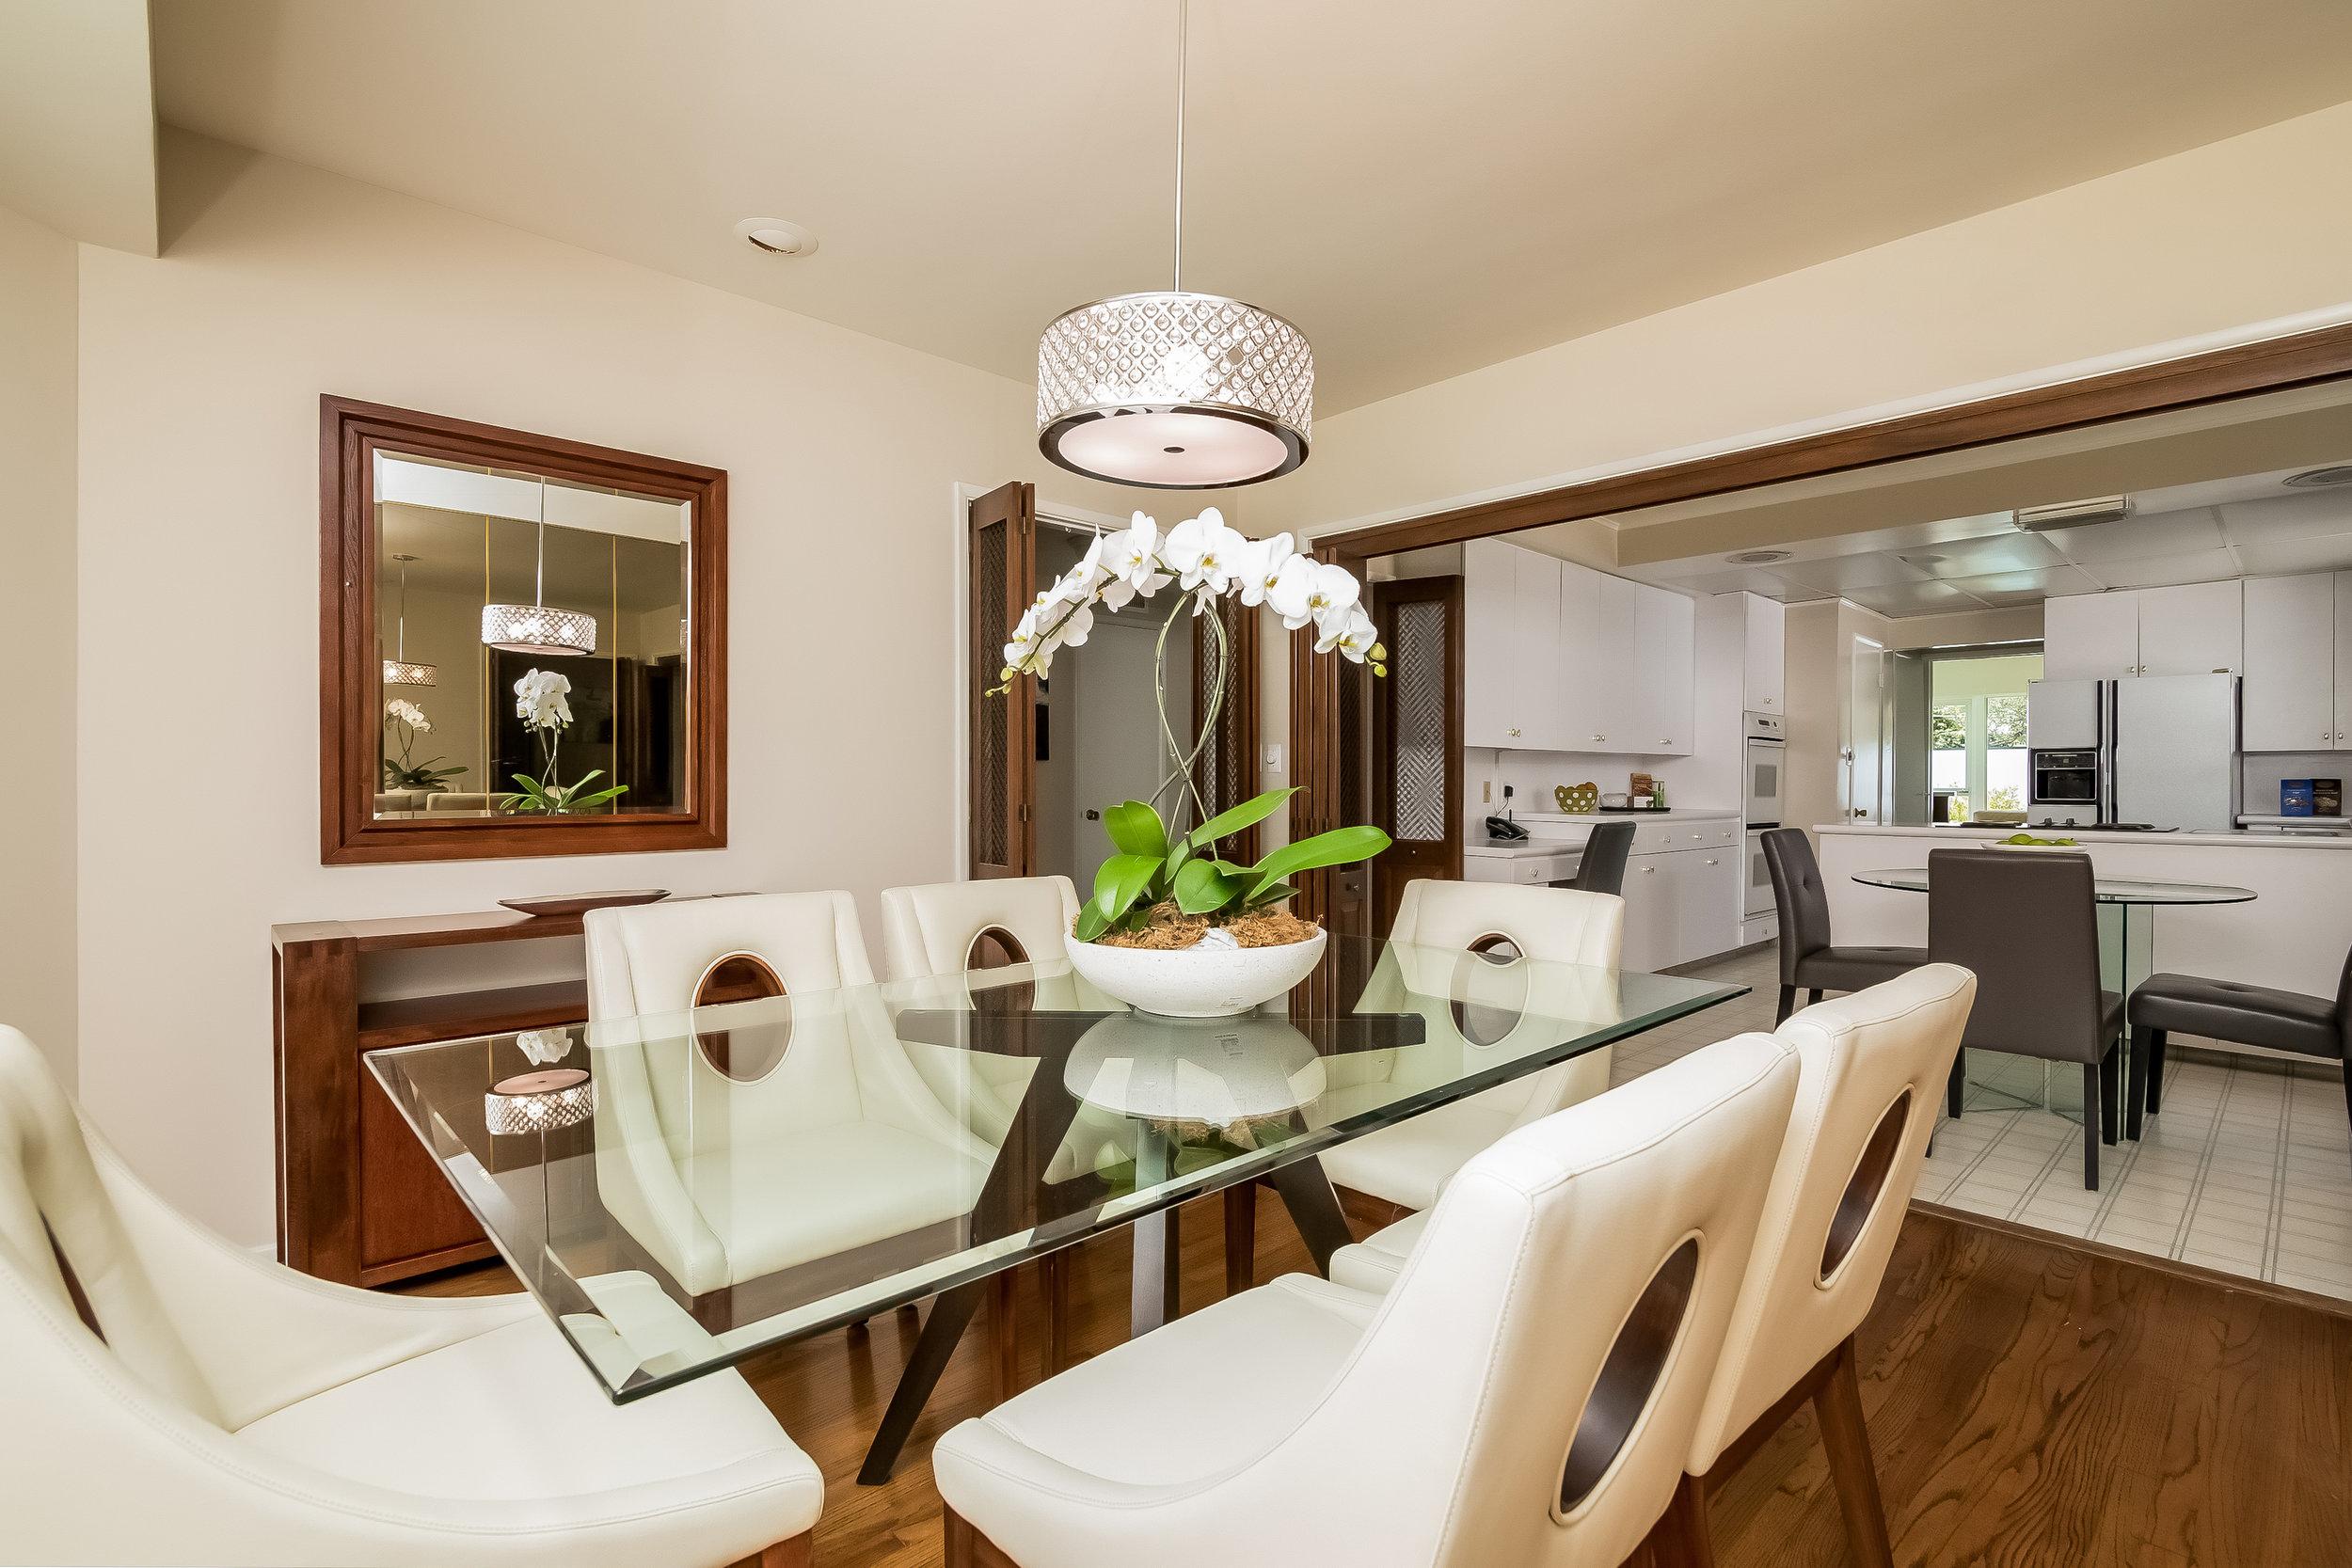 014-Dining_Room-2805286-large copy.jpg